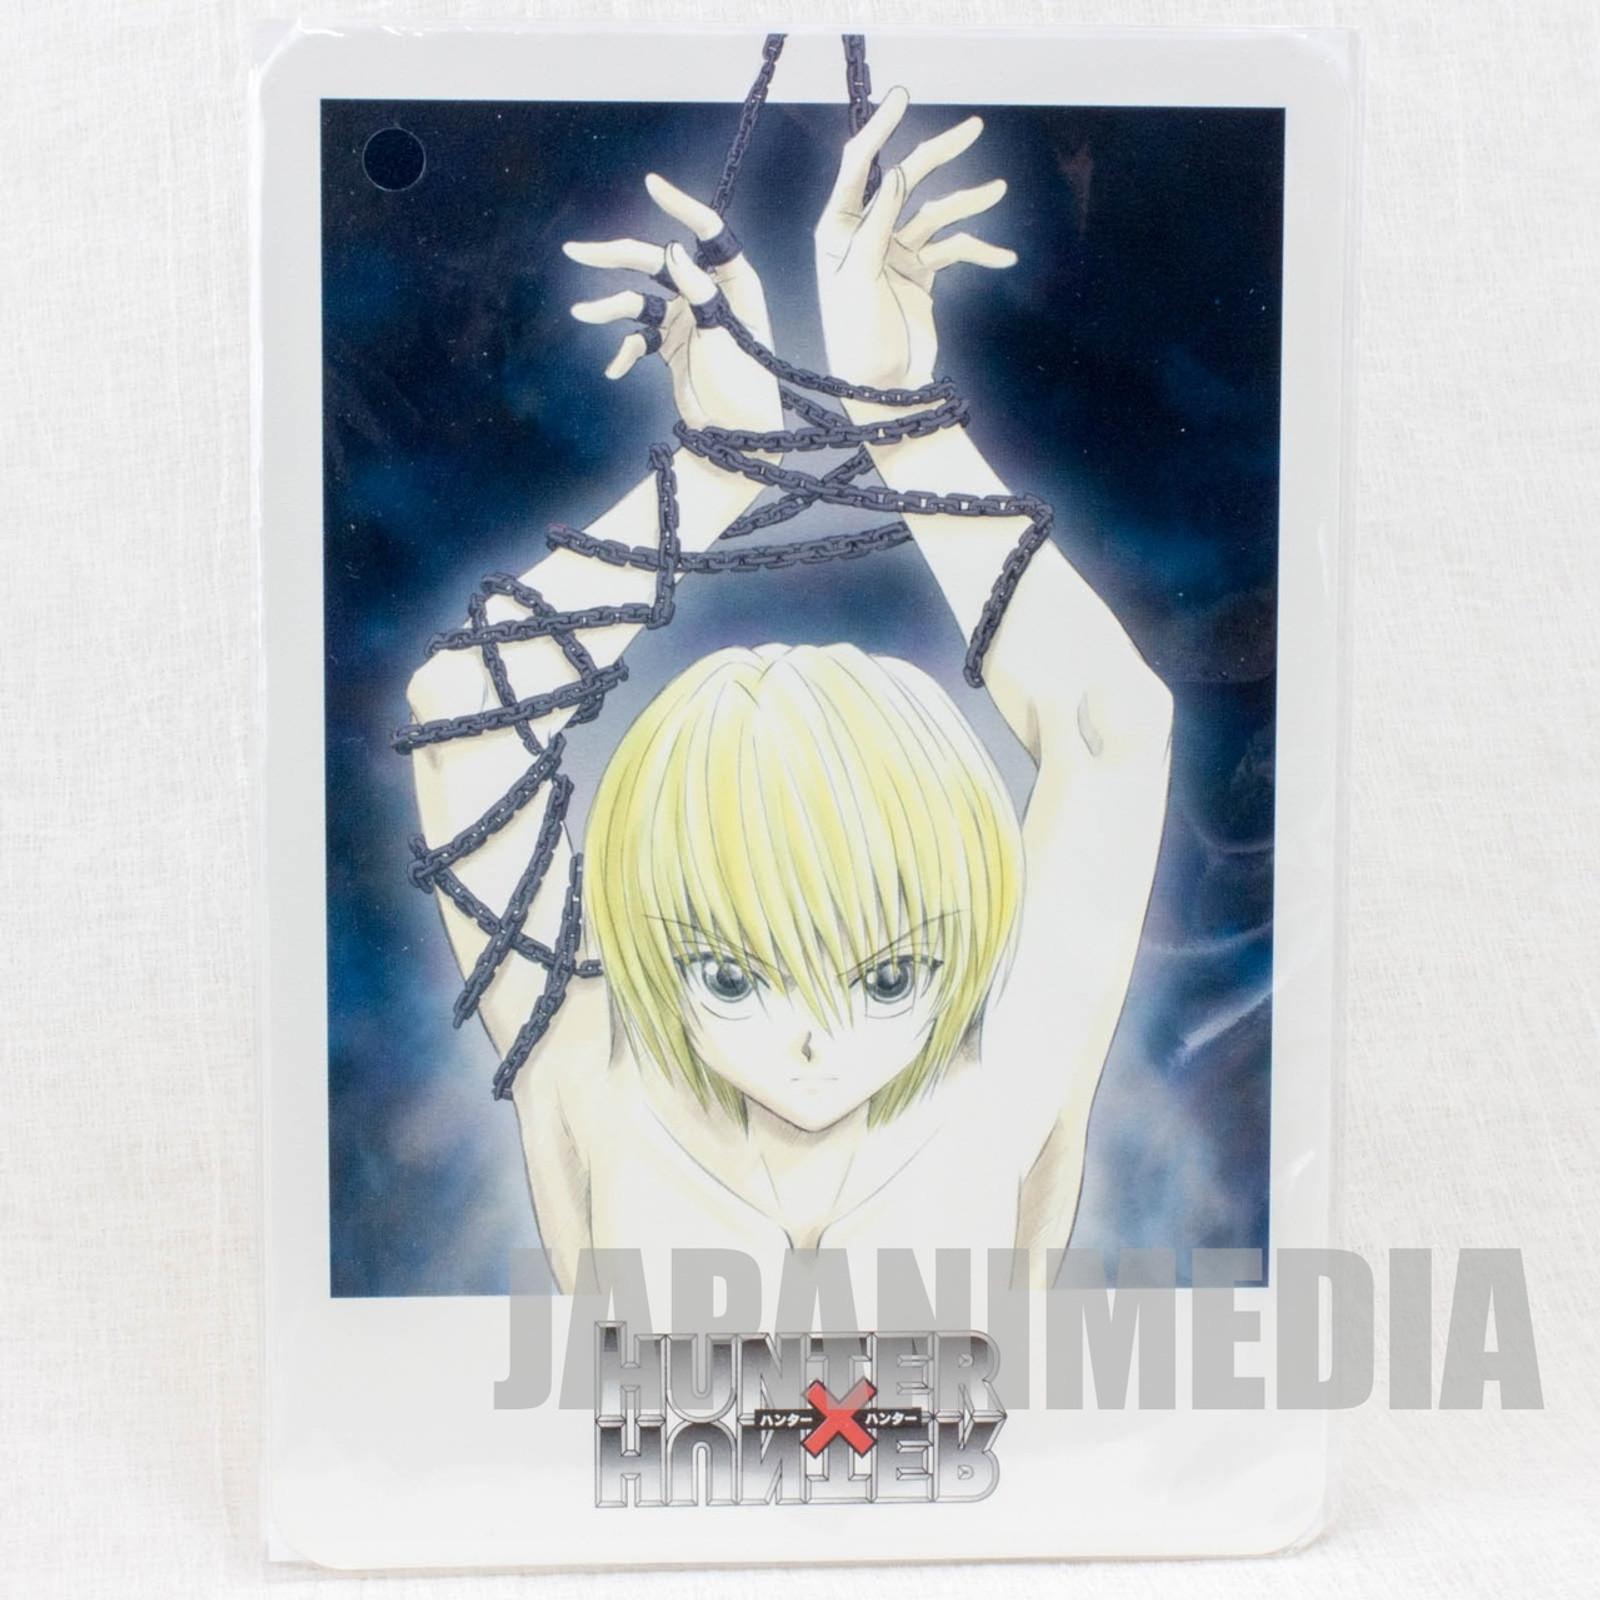 Hunter x Hunter Kurapika Jumbo Card Paddass BANDAI JAPAN ANIME MANGA #2